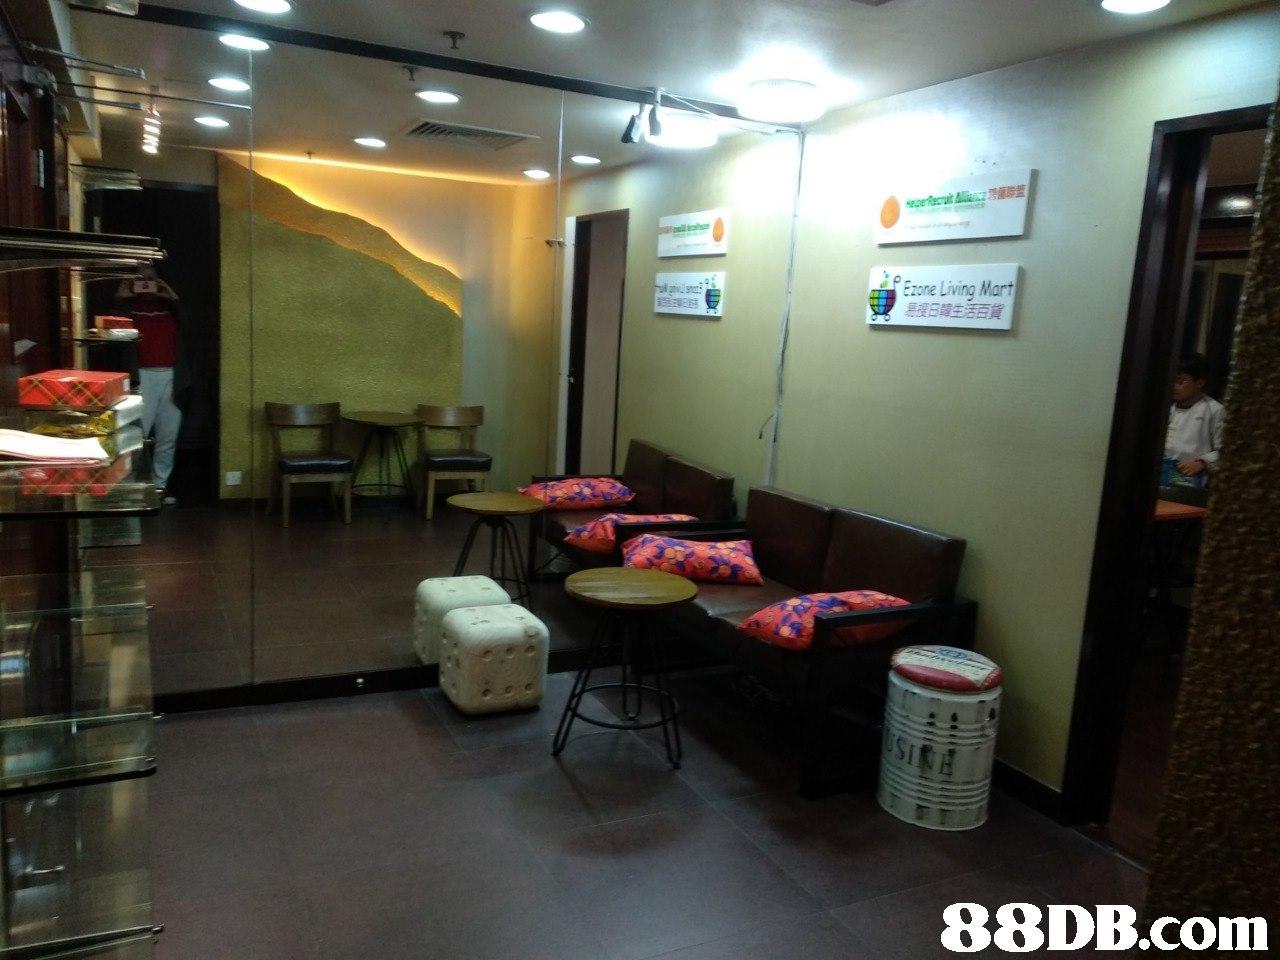 Ezone Living Mart 一日韓生活百貨   Building,Room,Interior design,